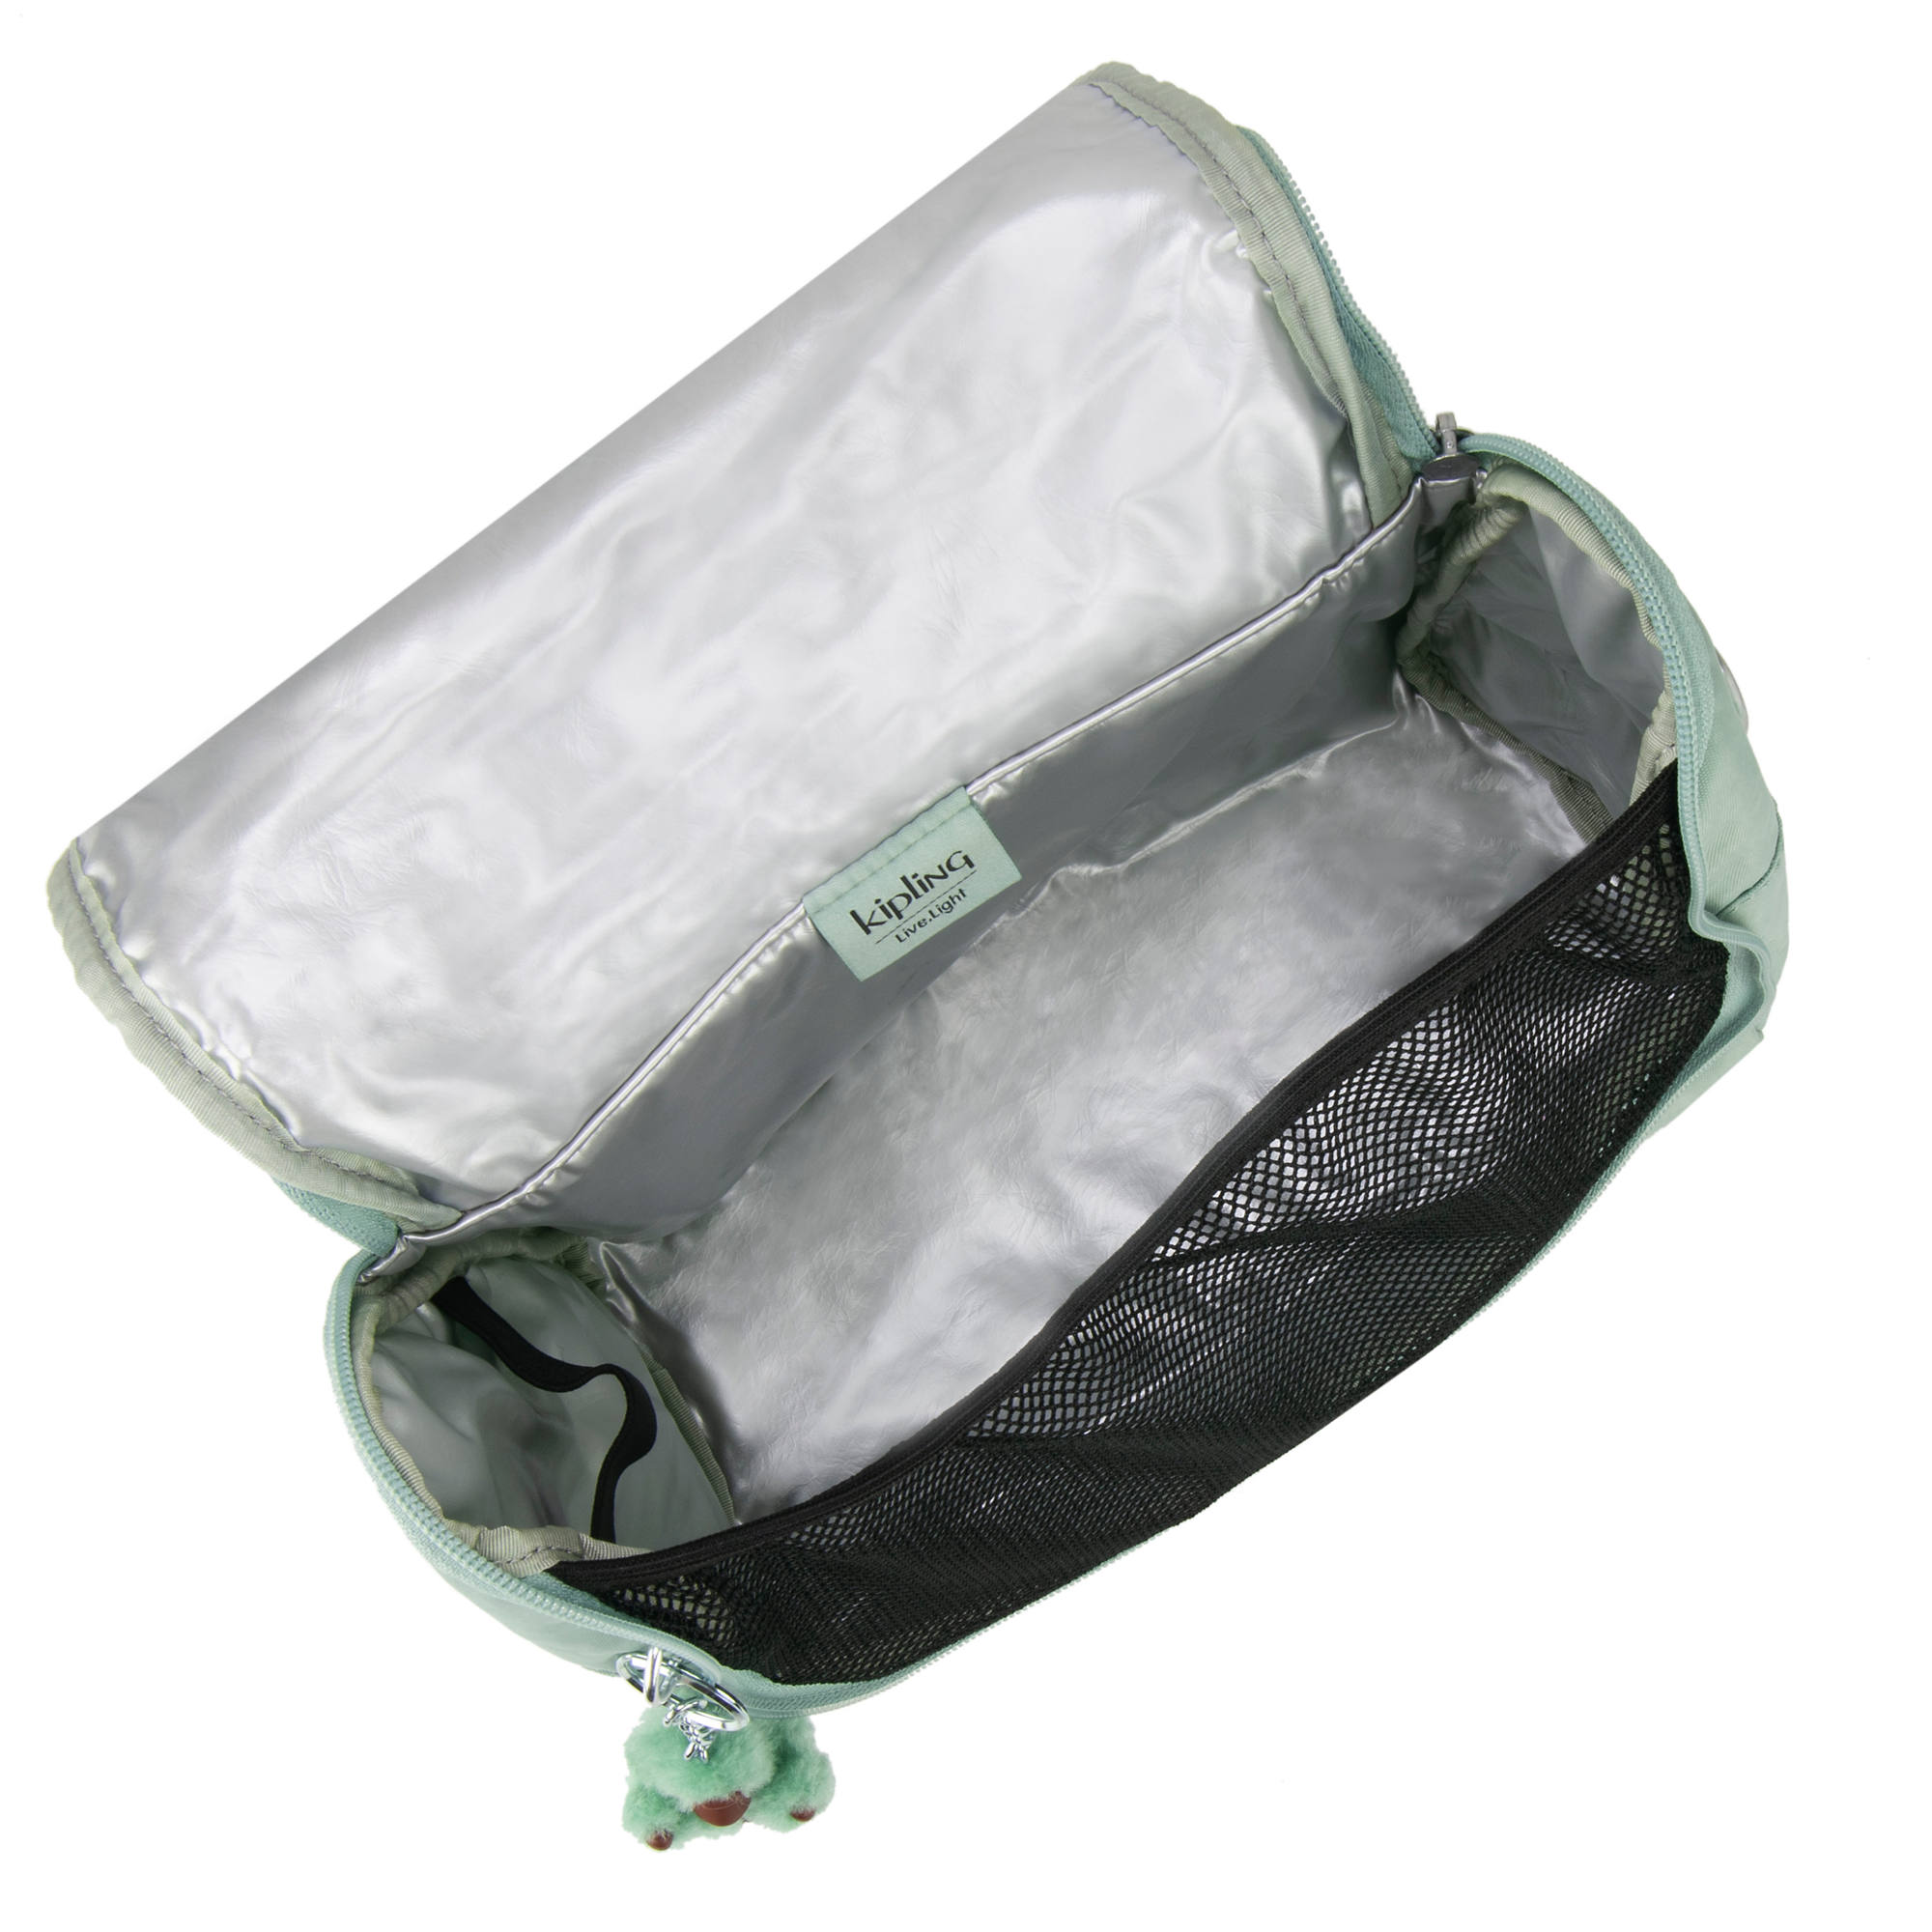 6c3a058f89 Kichirou lunch bag fern green large jpg 2000x2000 Women lunch bag kipling